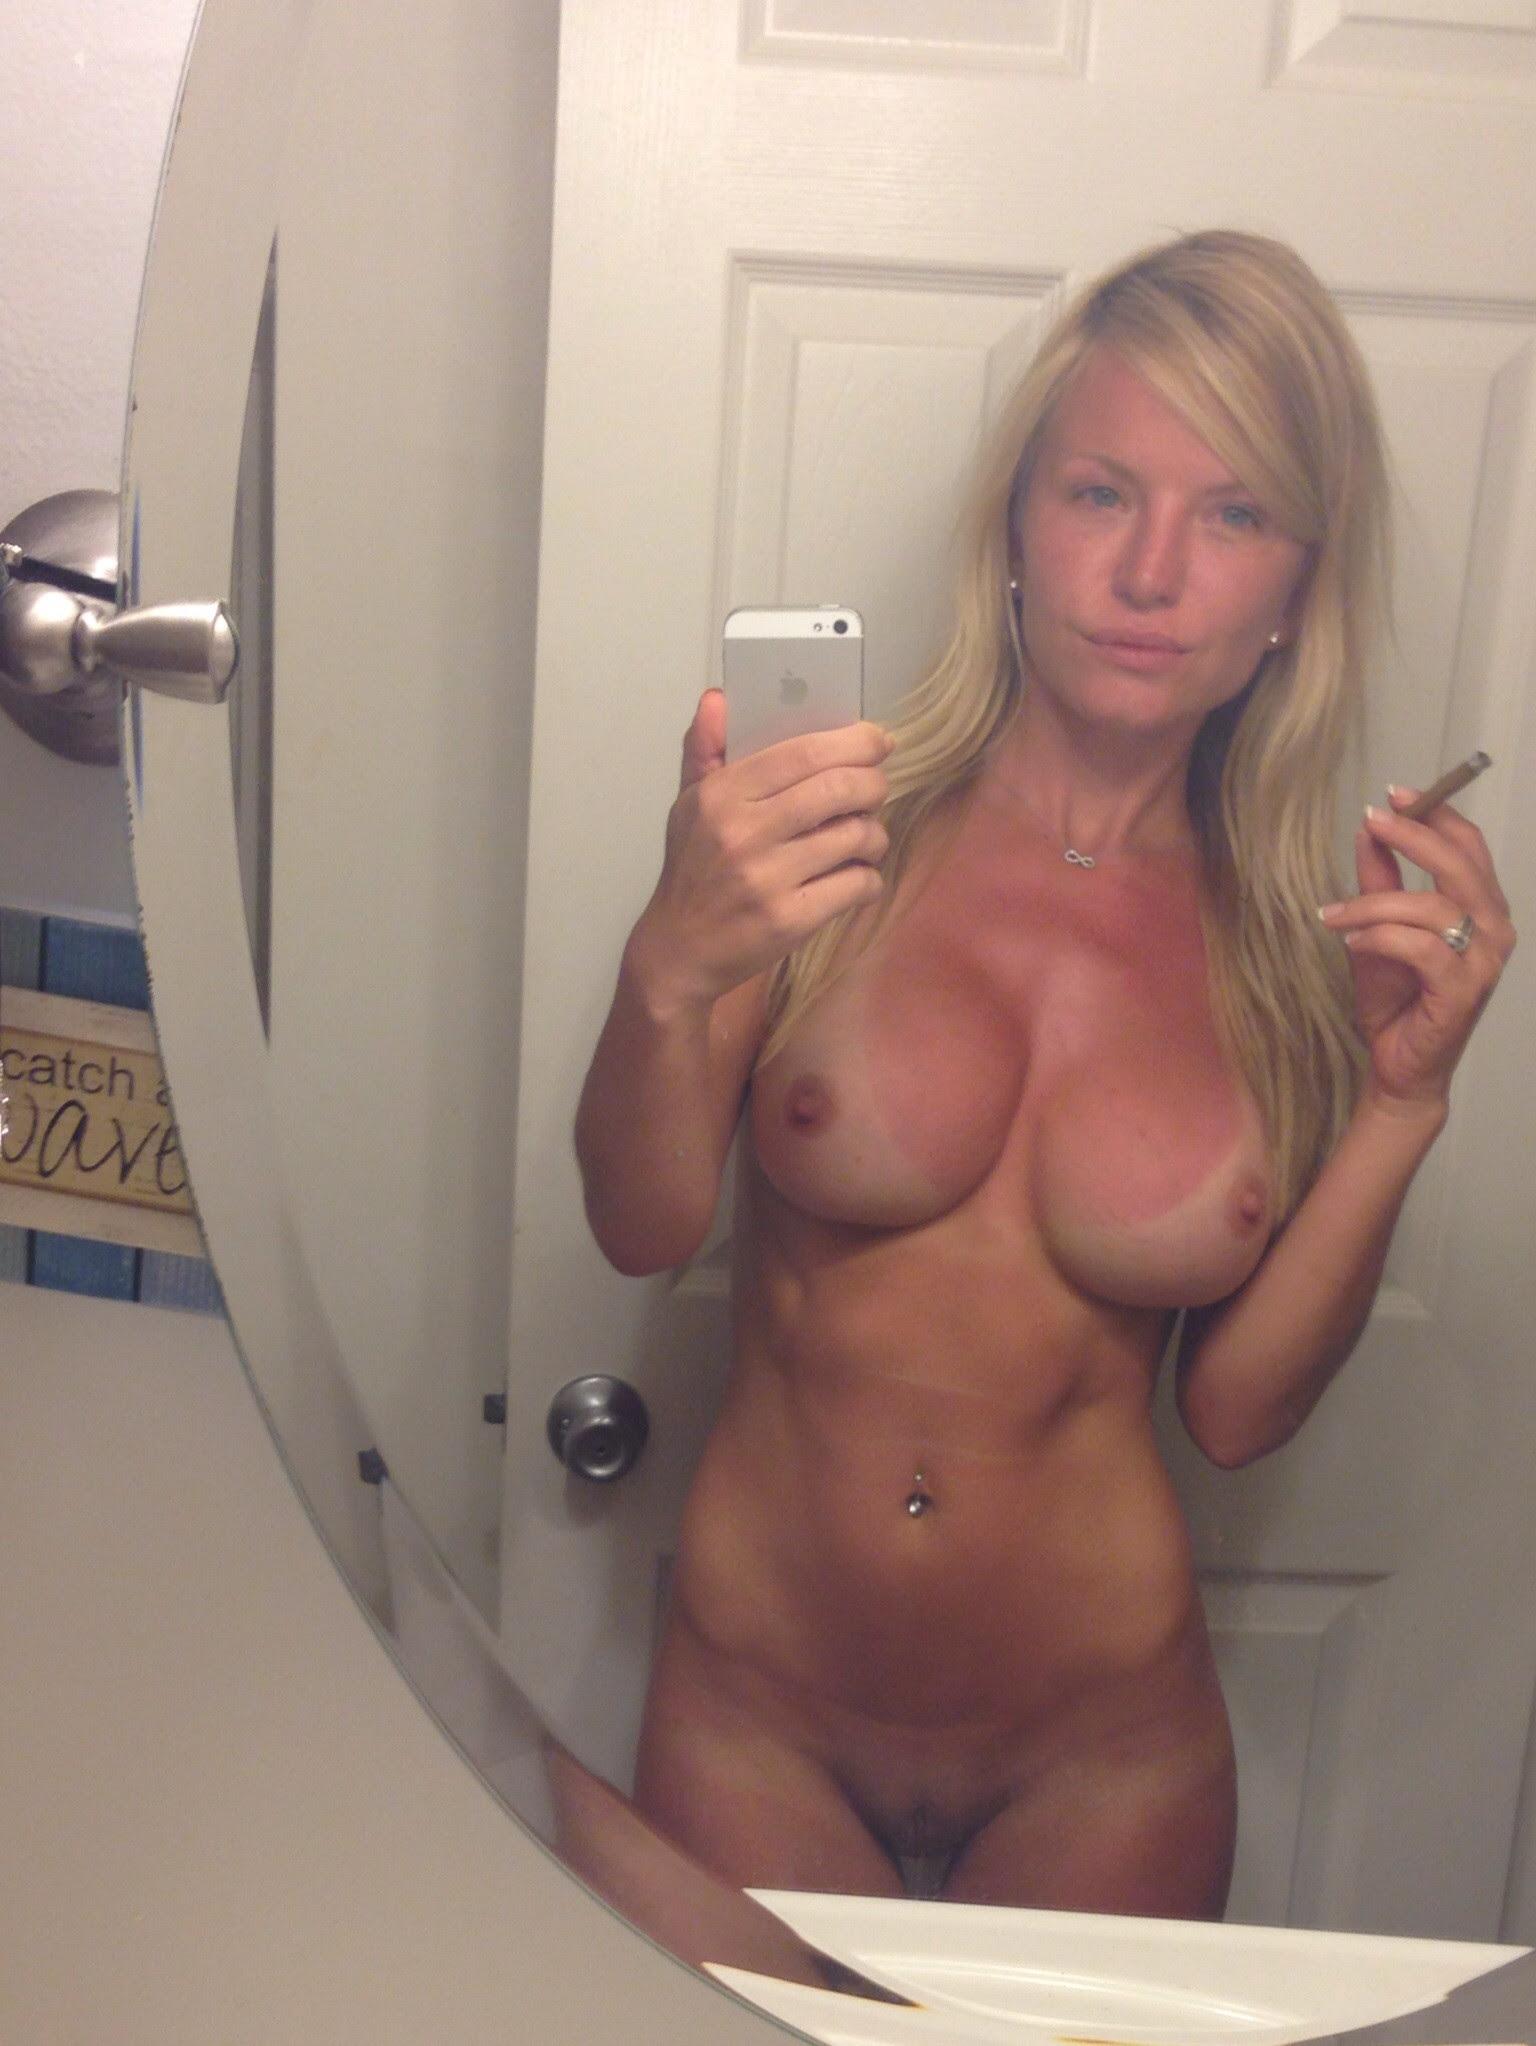 moms naked in tpilet